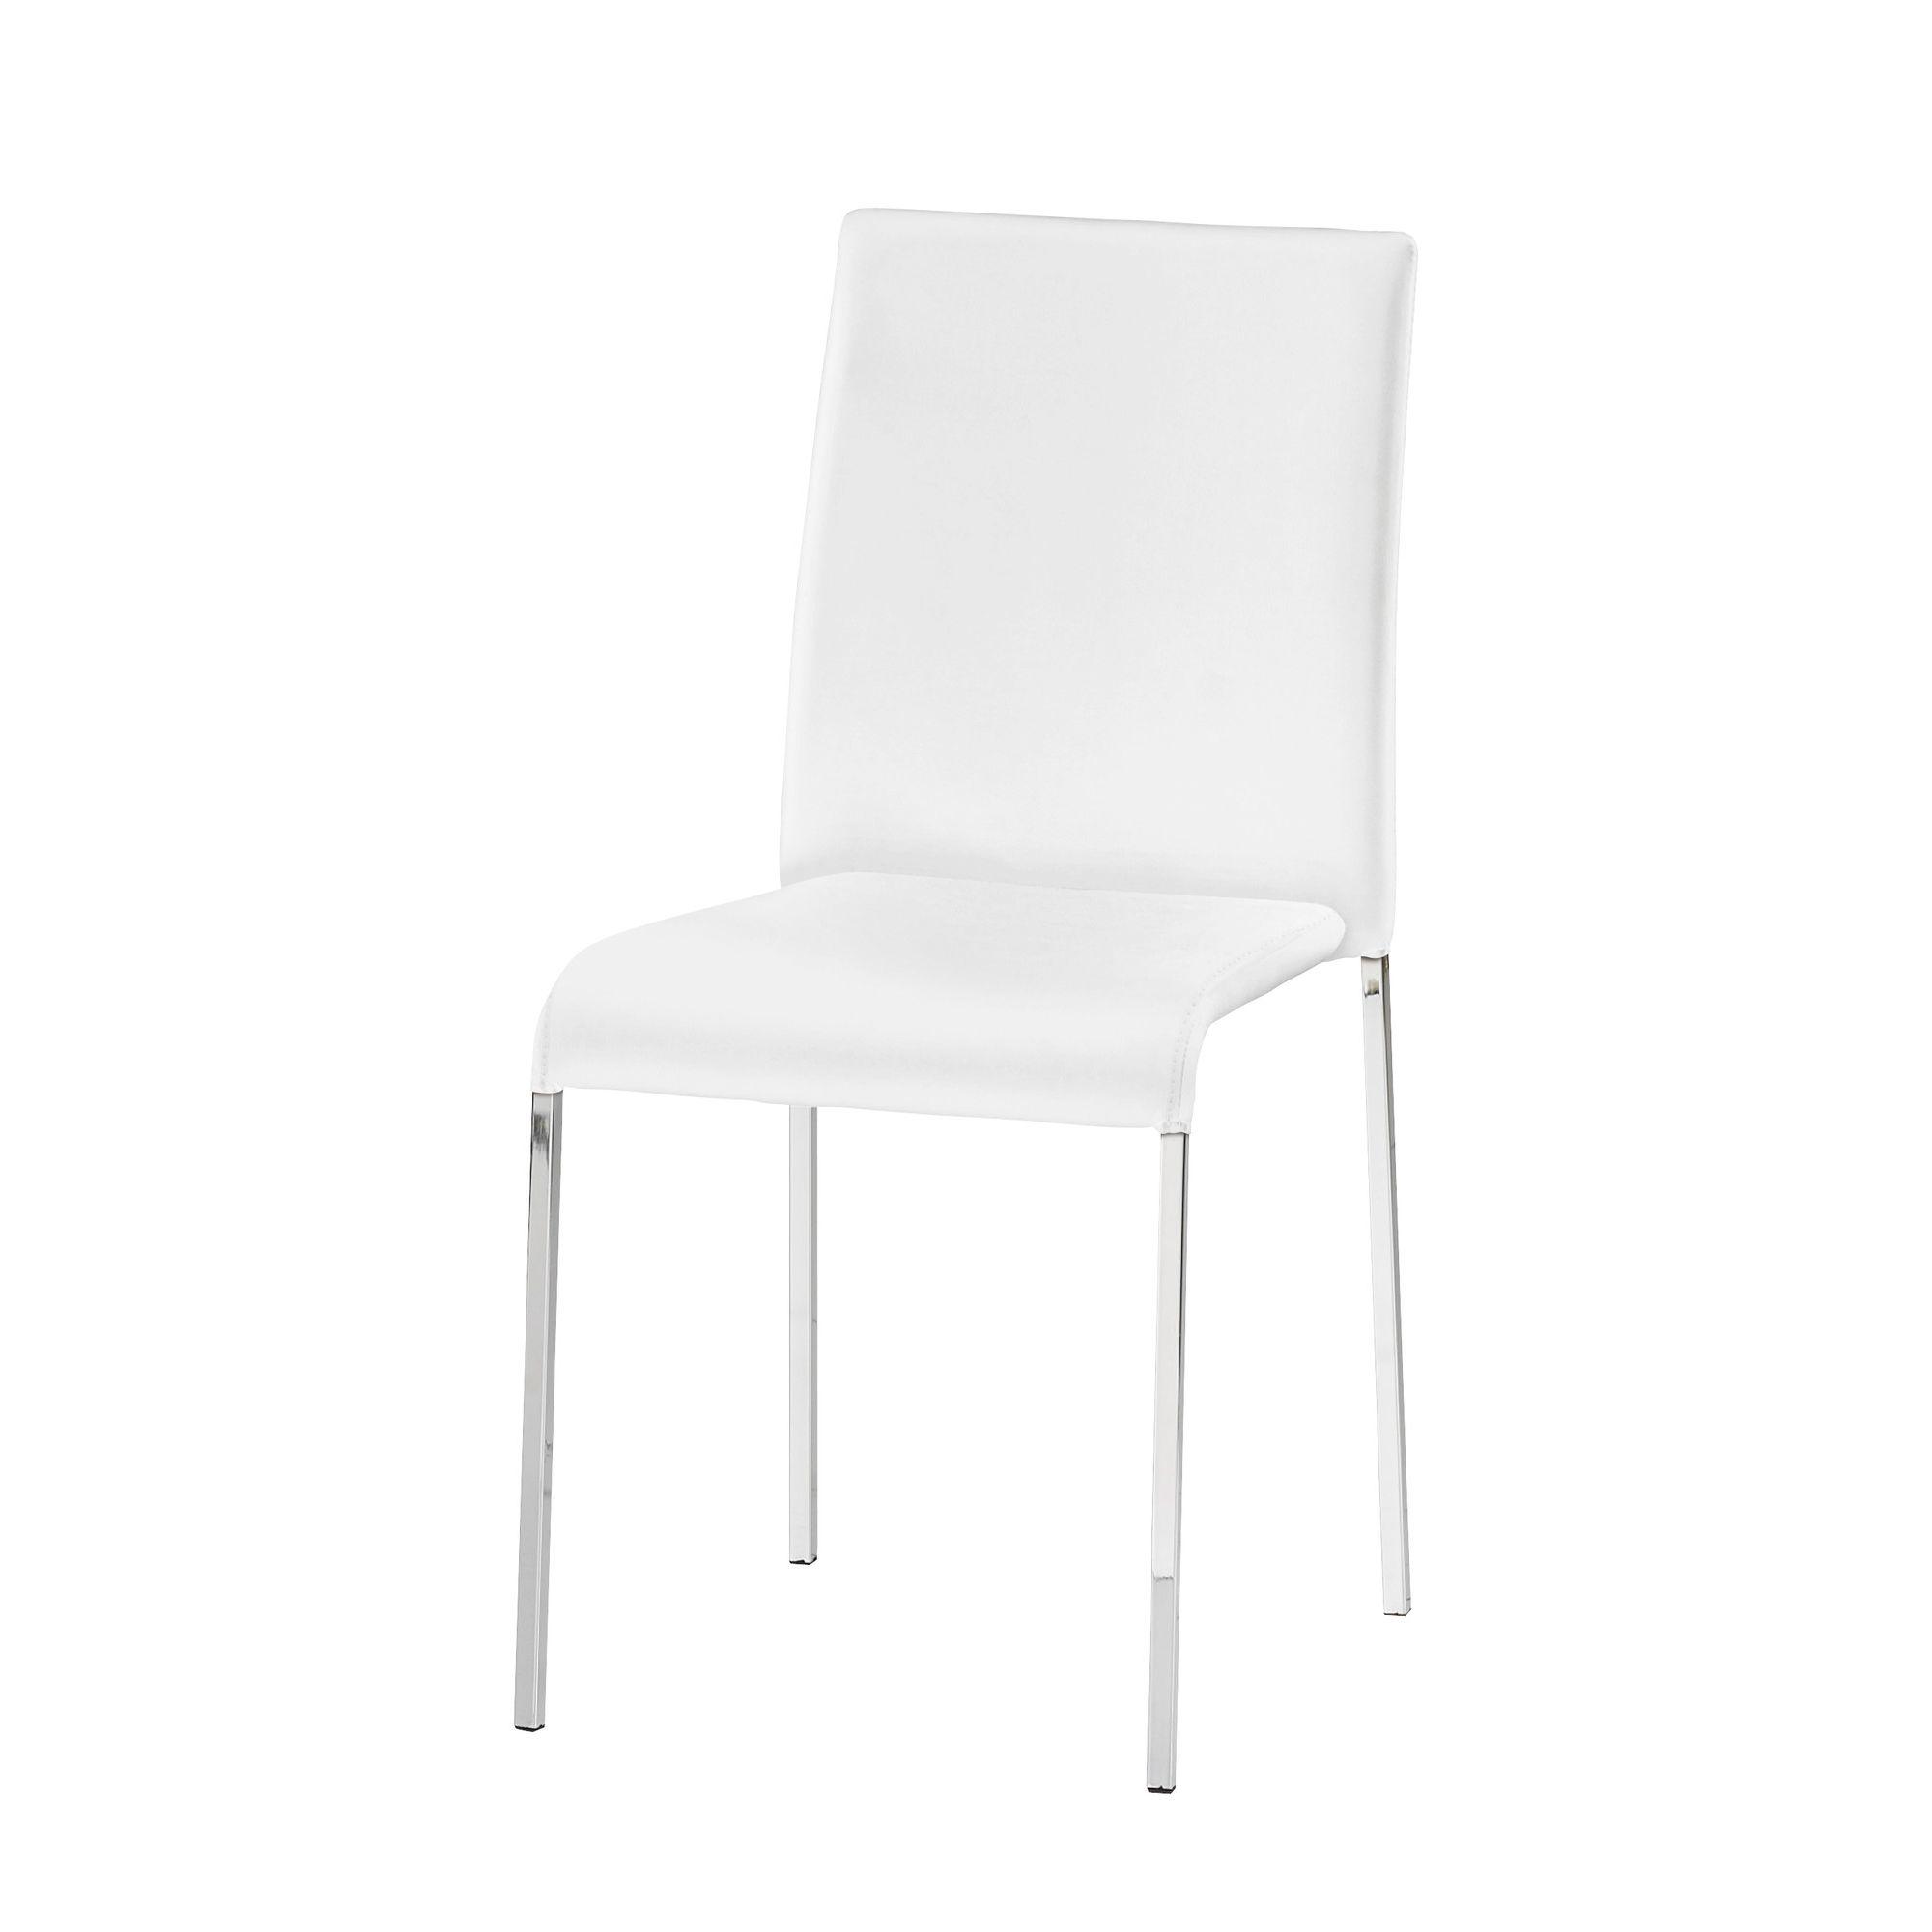 Tvilum Lilly Dining Set - White at Tesco Direct